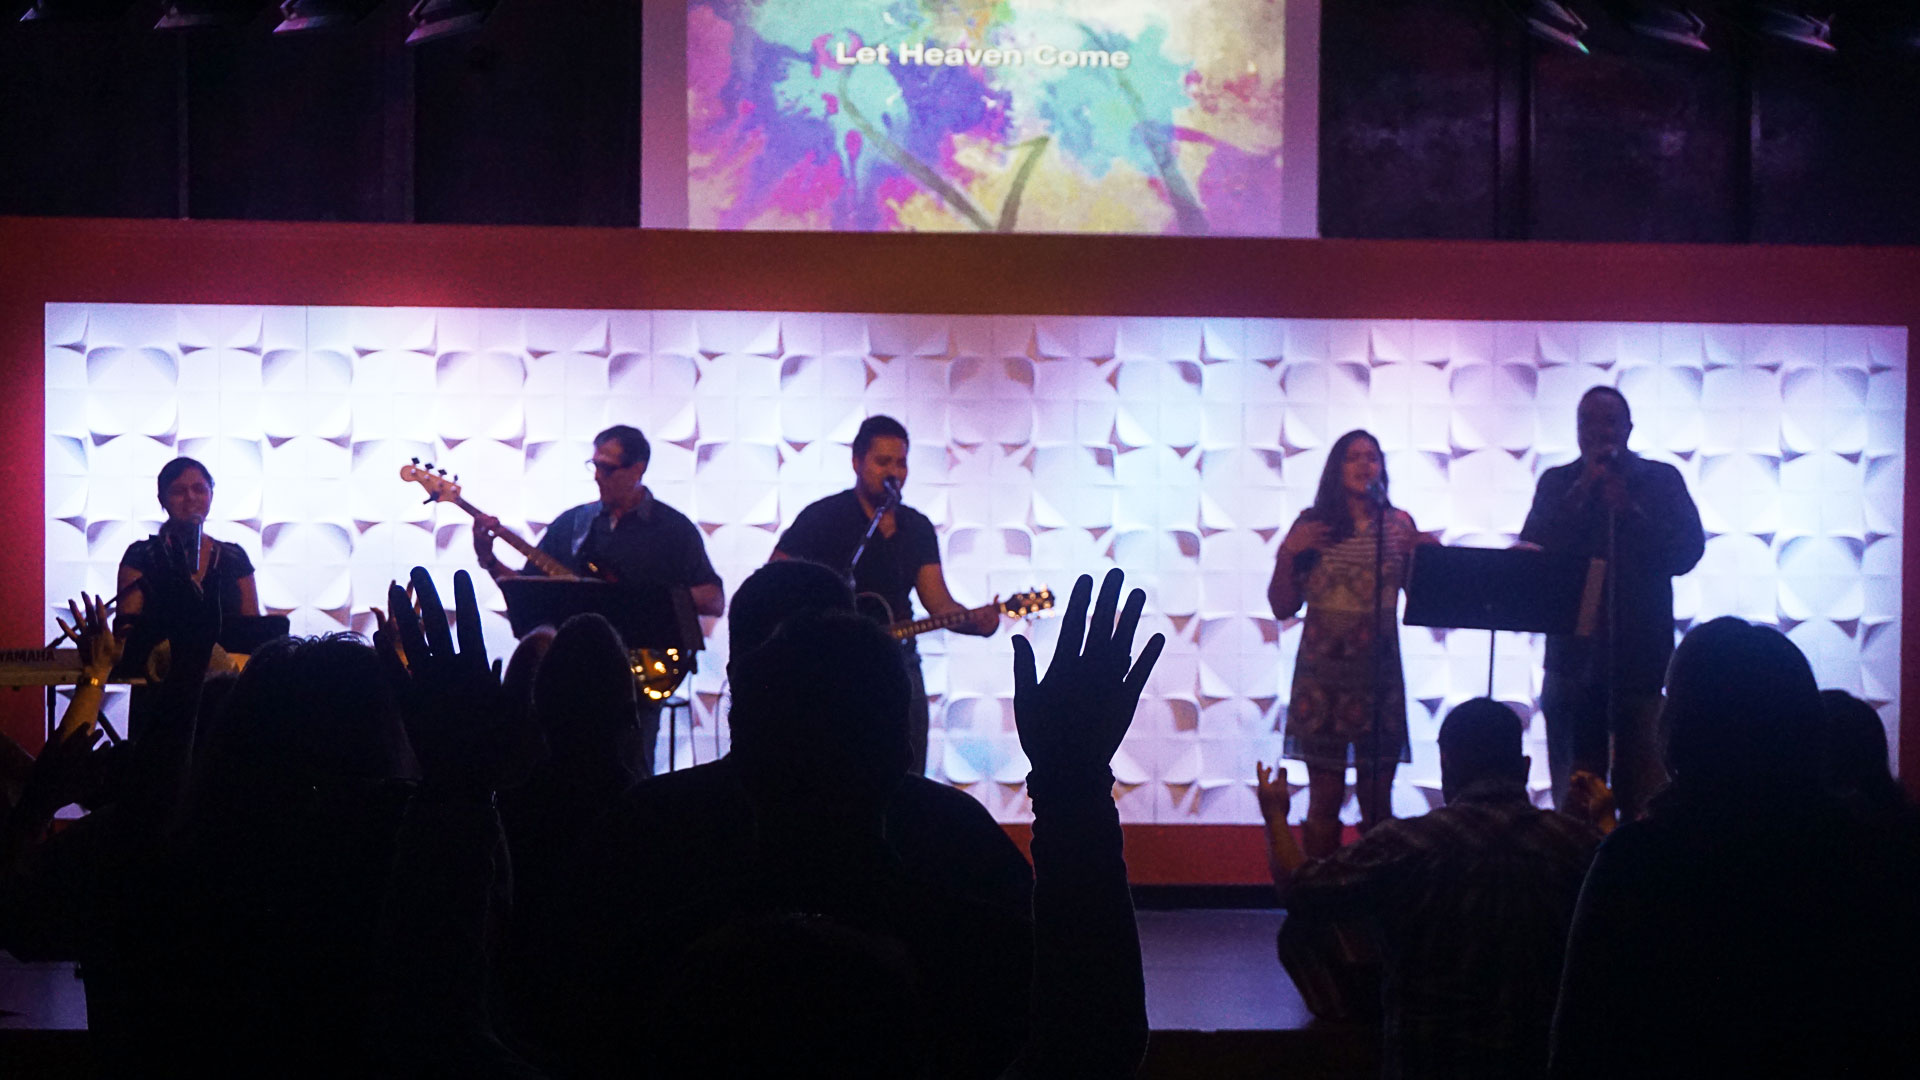 GWC-Worship-1920-1080-2016